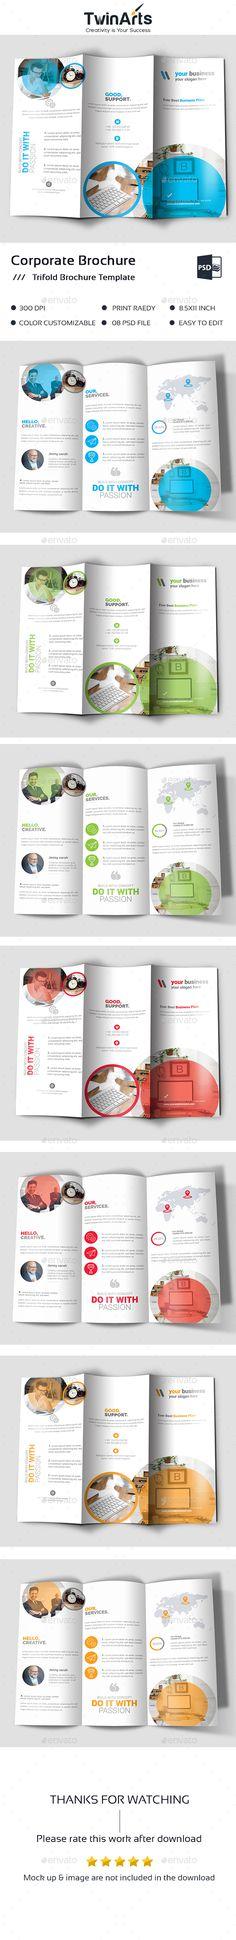 Digital Marketing & Advertising Agency Brochure | Pinterest ...